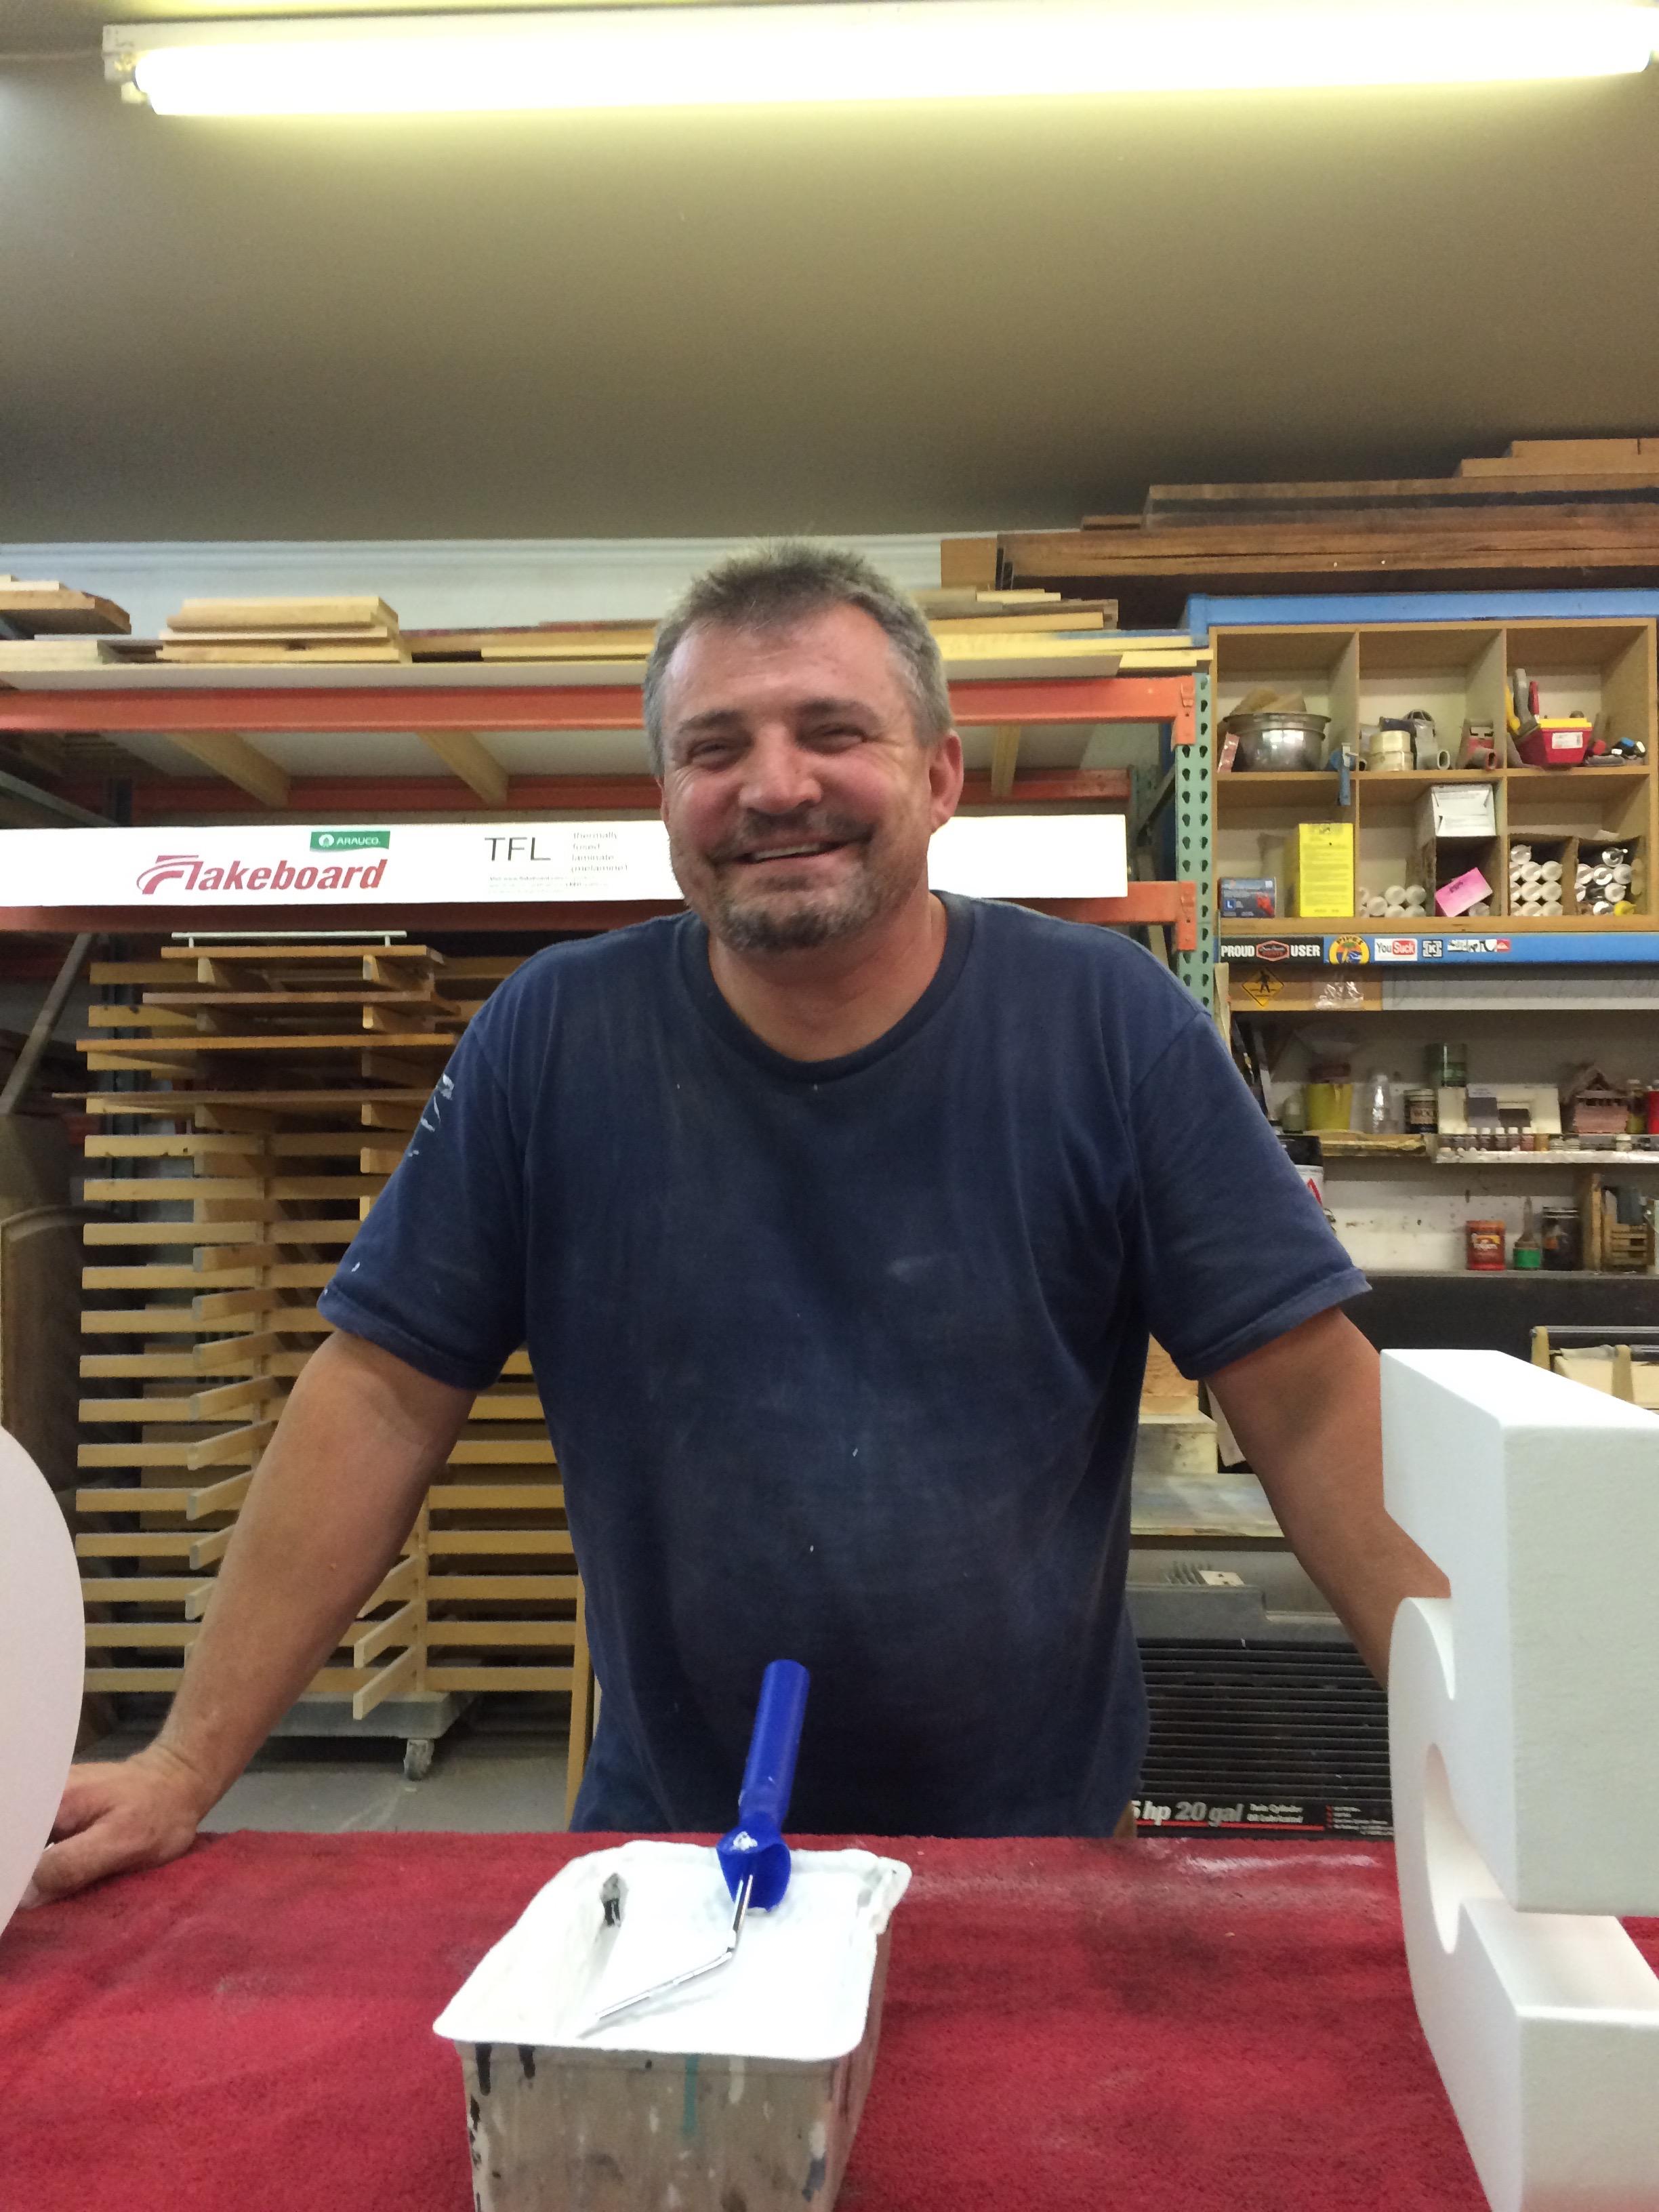 Dave in shop, David Perrin, David in DCM shop, DCM, Dave's custom Millwork, dcmperrin